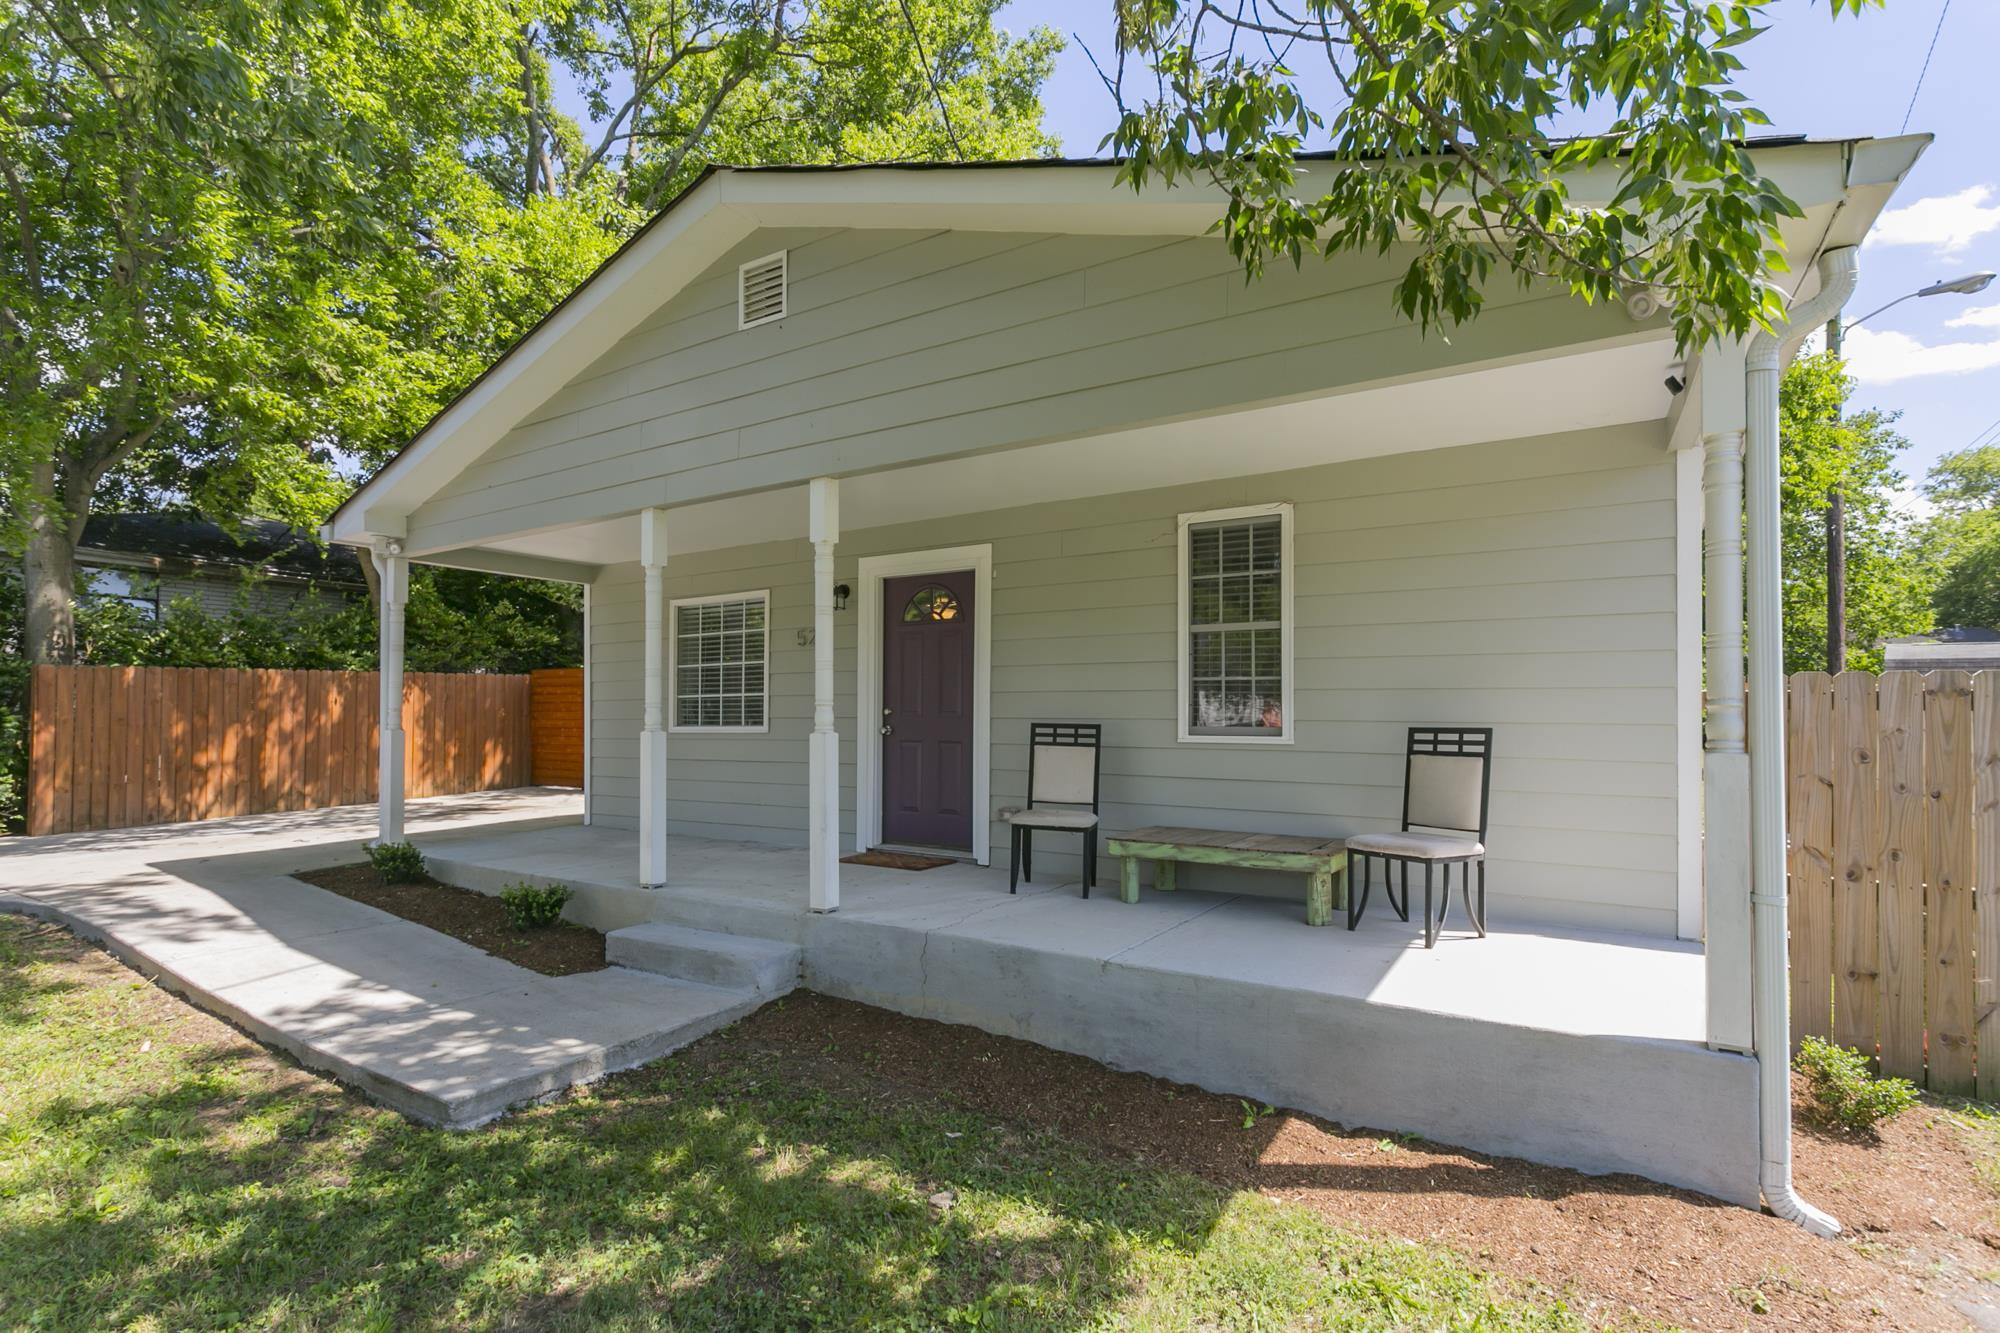 521 Radnor St, Nashville, TN 37211 - Nashville, TN real estate listing